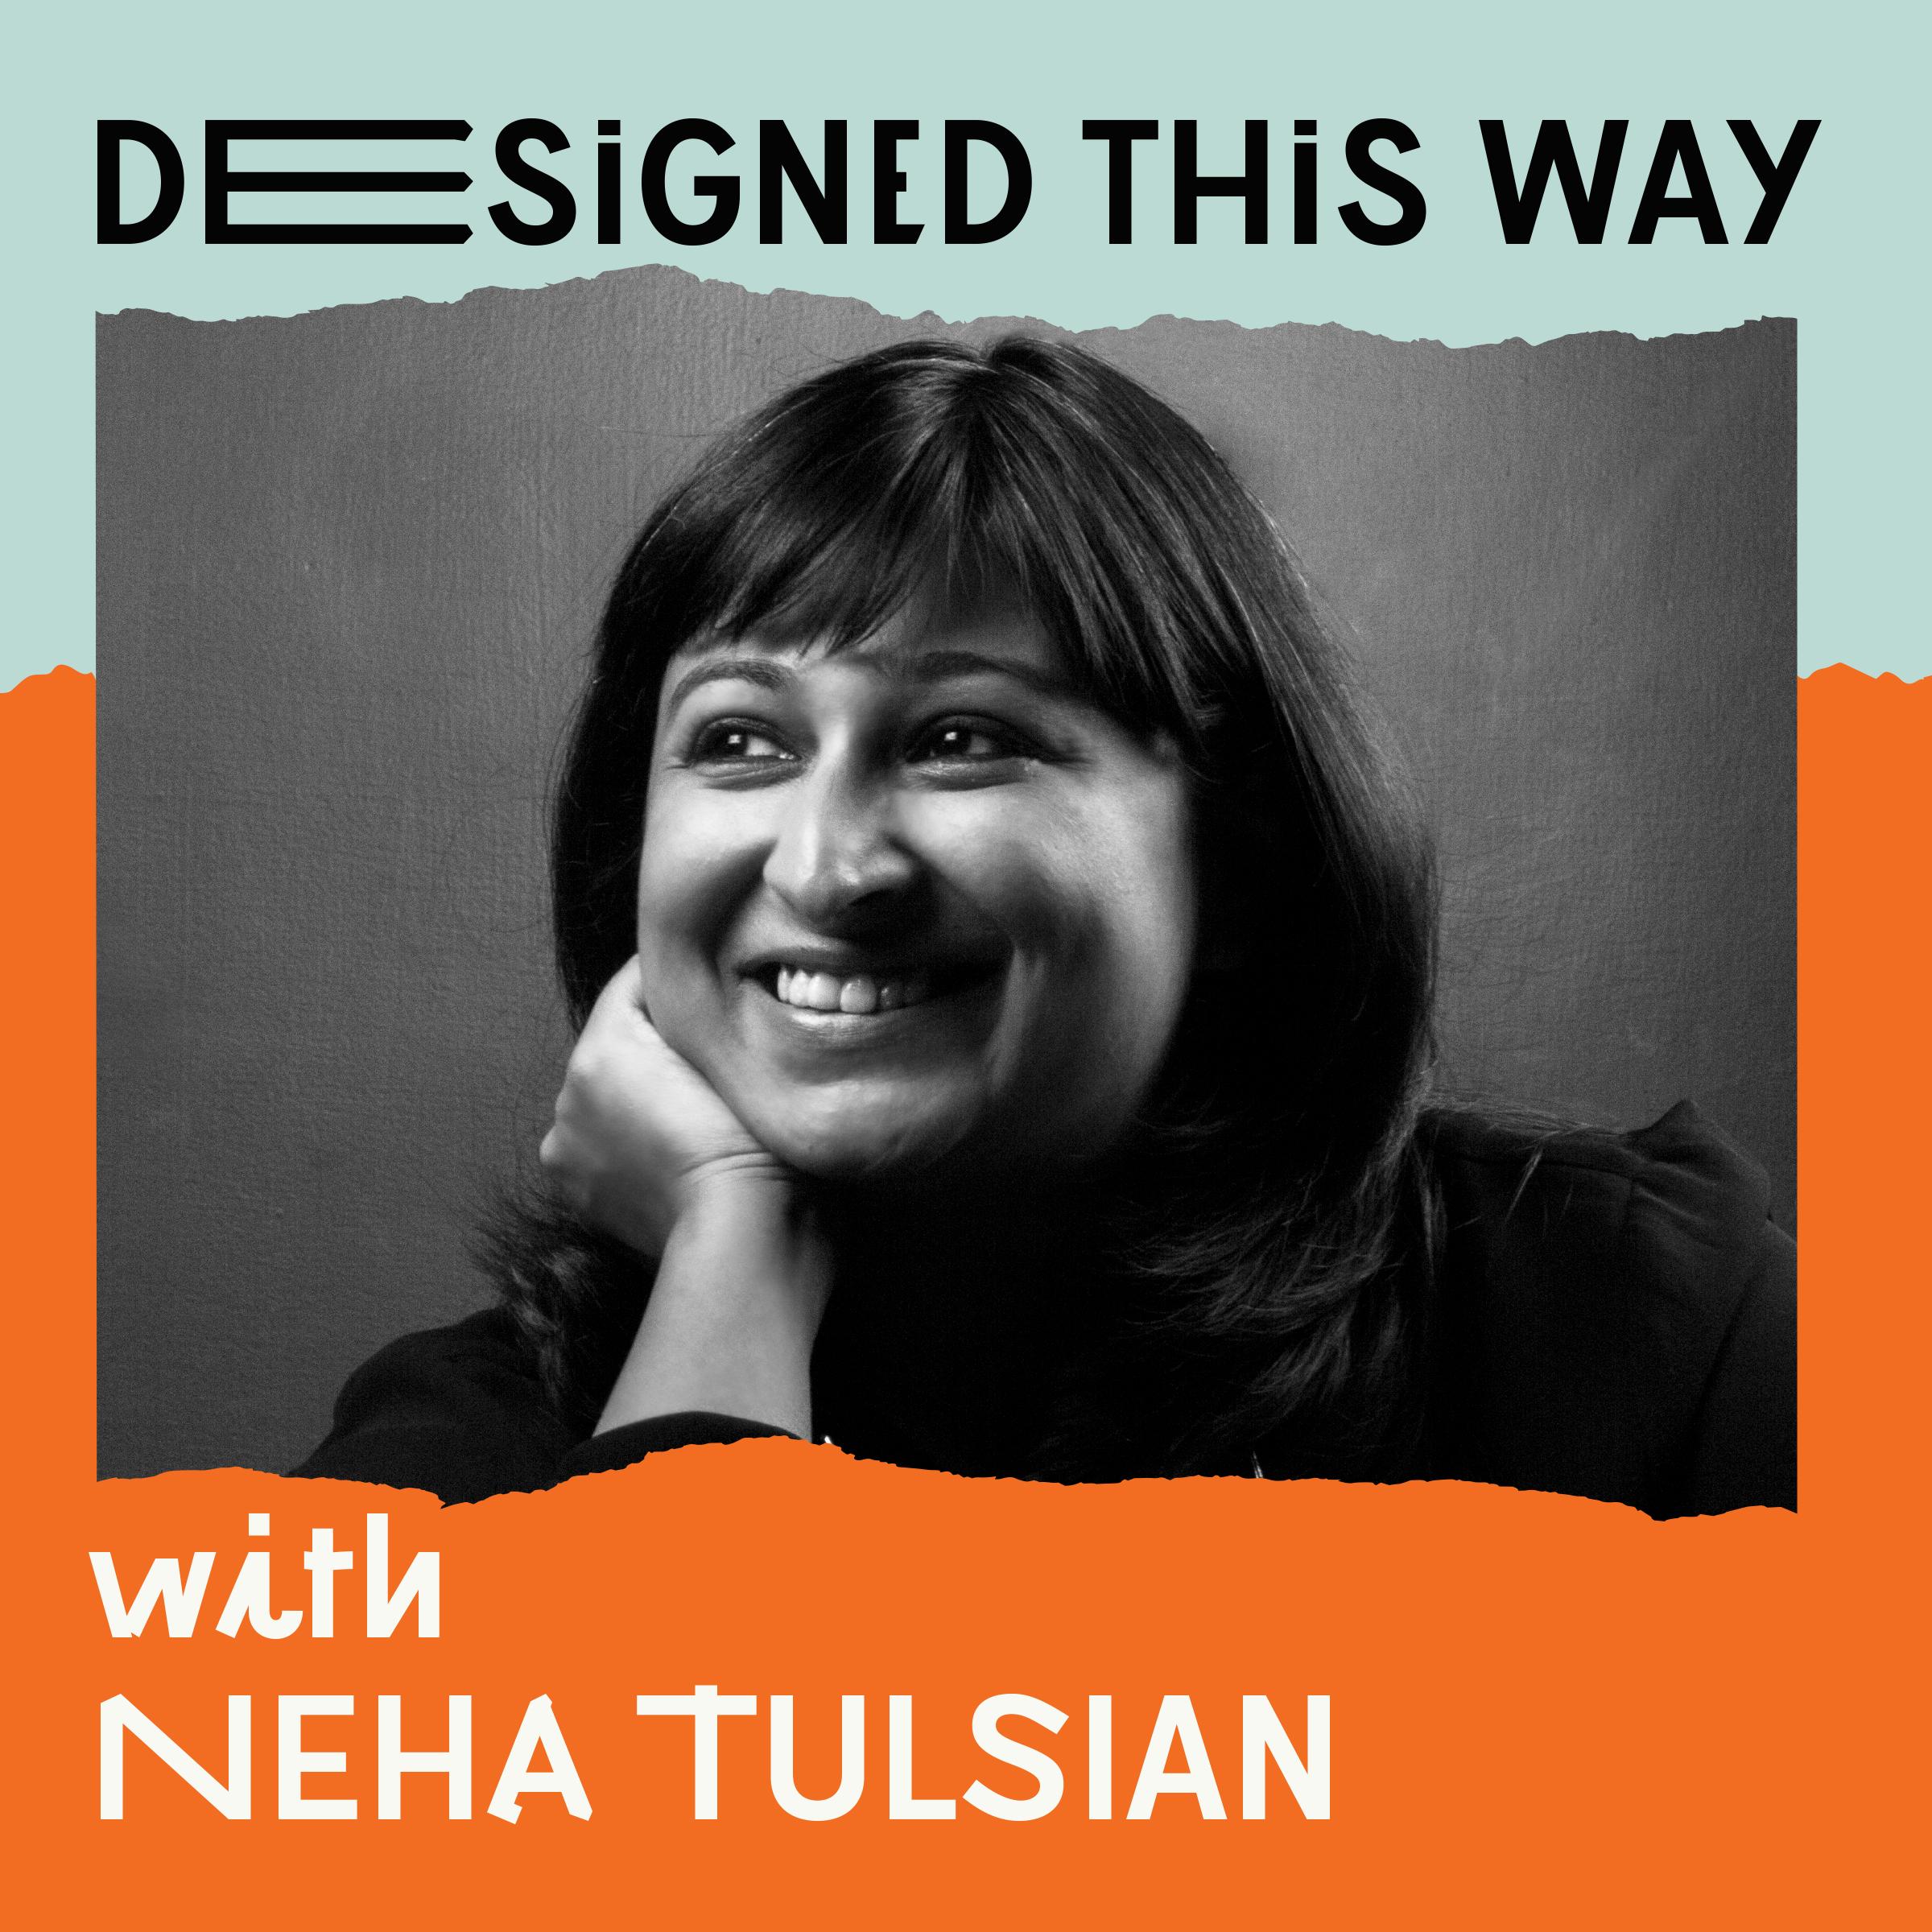 Neha Tulsian